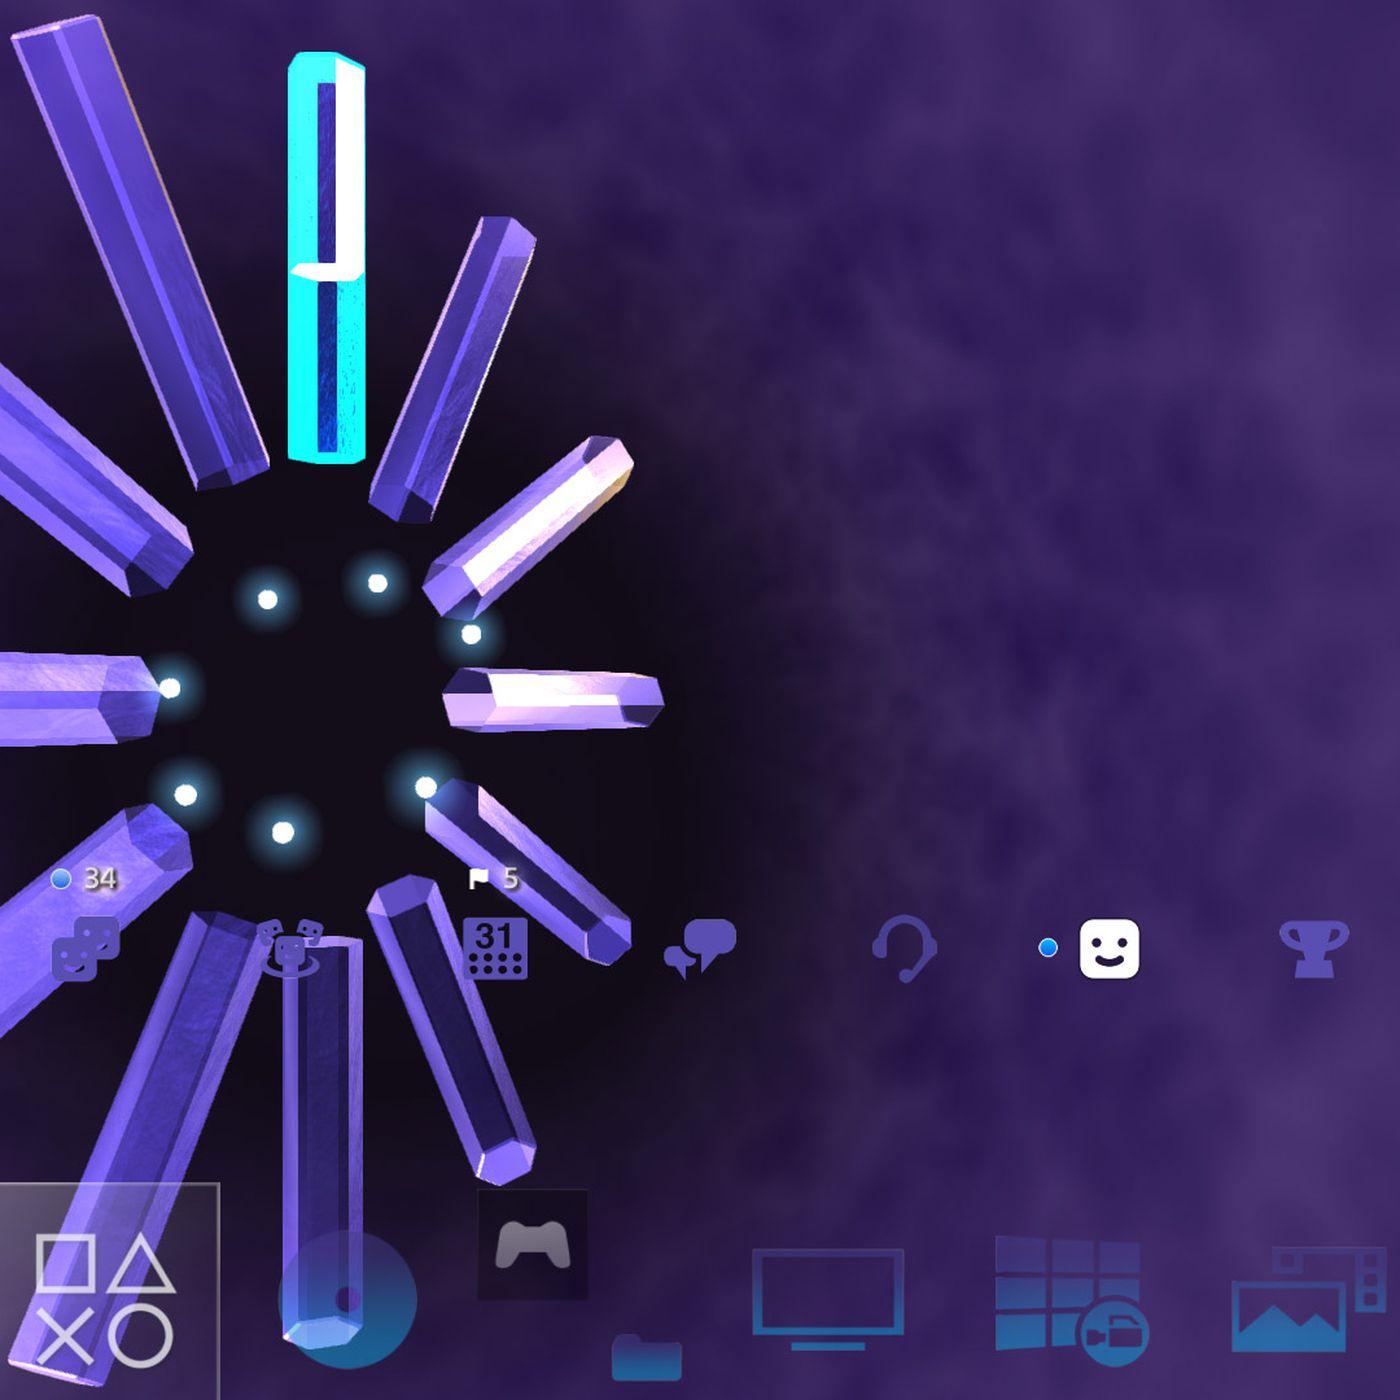 Sonys Legacy PS2 theme for PS4 is a fun hit of nostalgia   Polygon 1400x1400